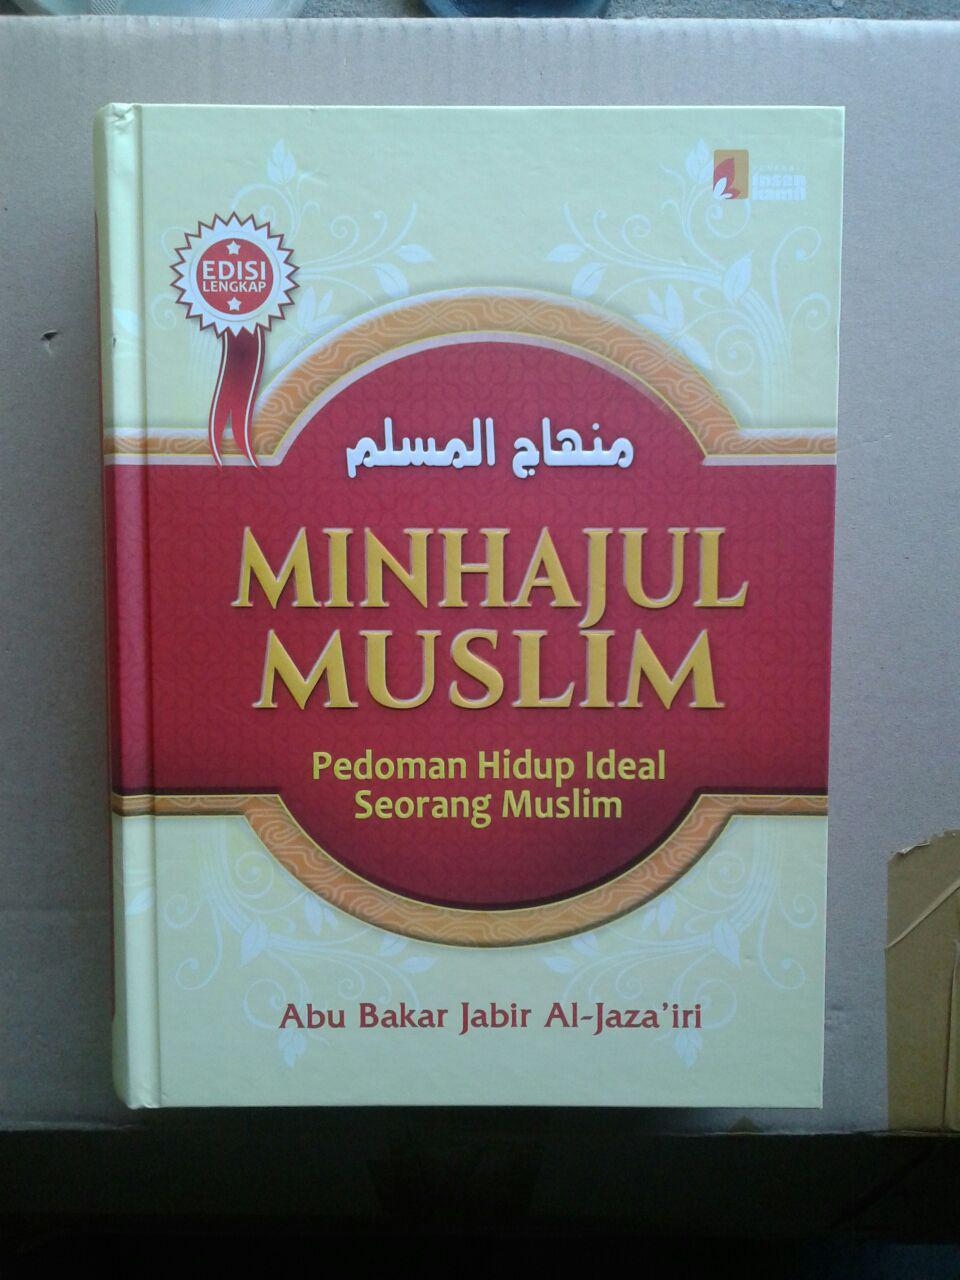 Buku Minhajul Muslim Pedoman Hidup Ideal Seorang Muslim cover